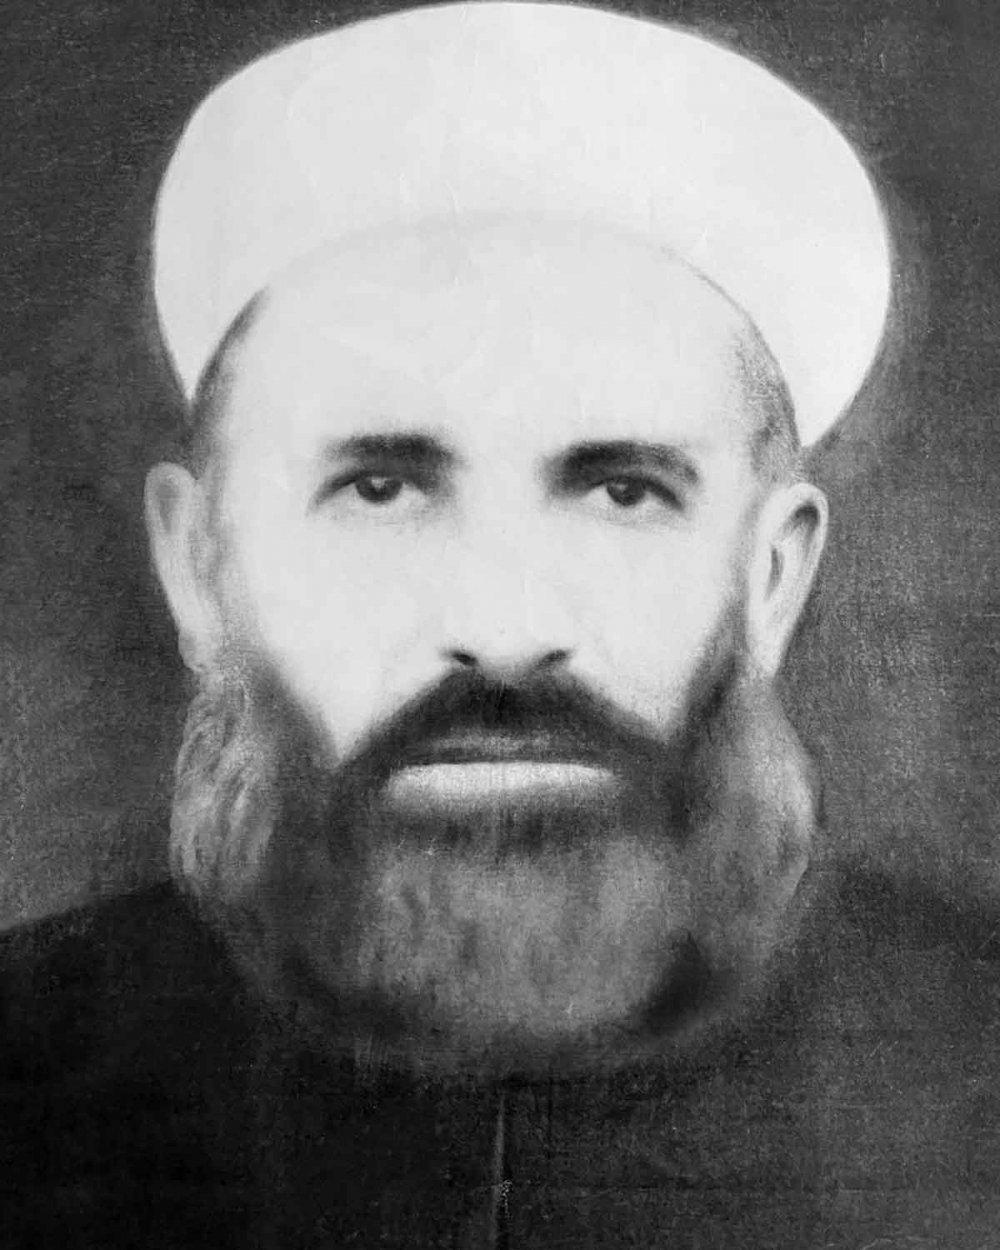 Şeyh Muhammed Beşir el-Halilî